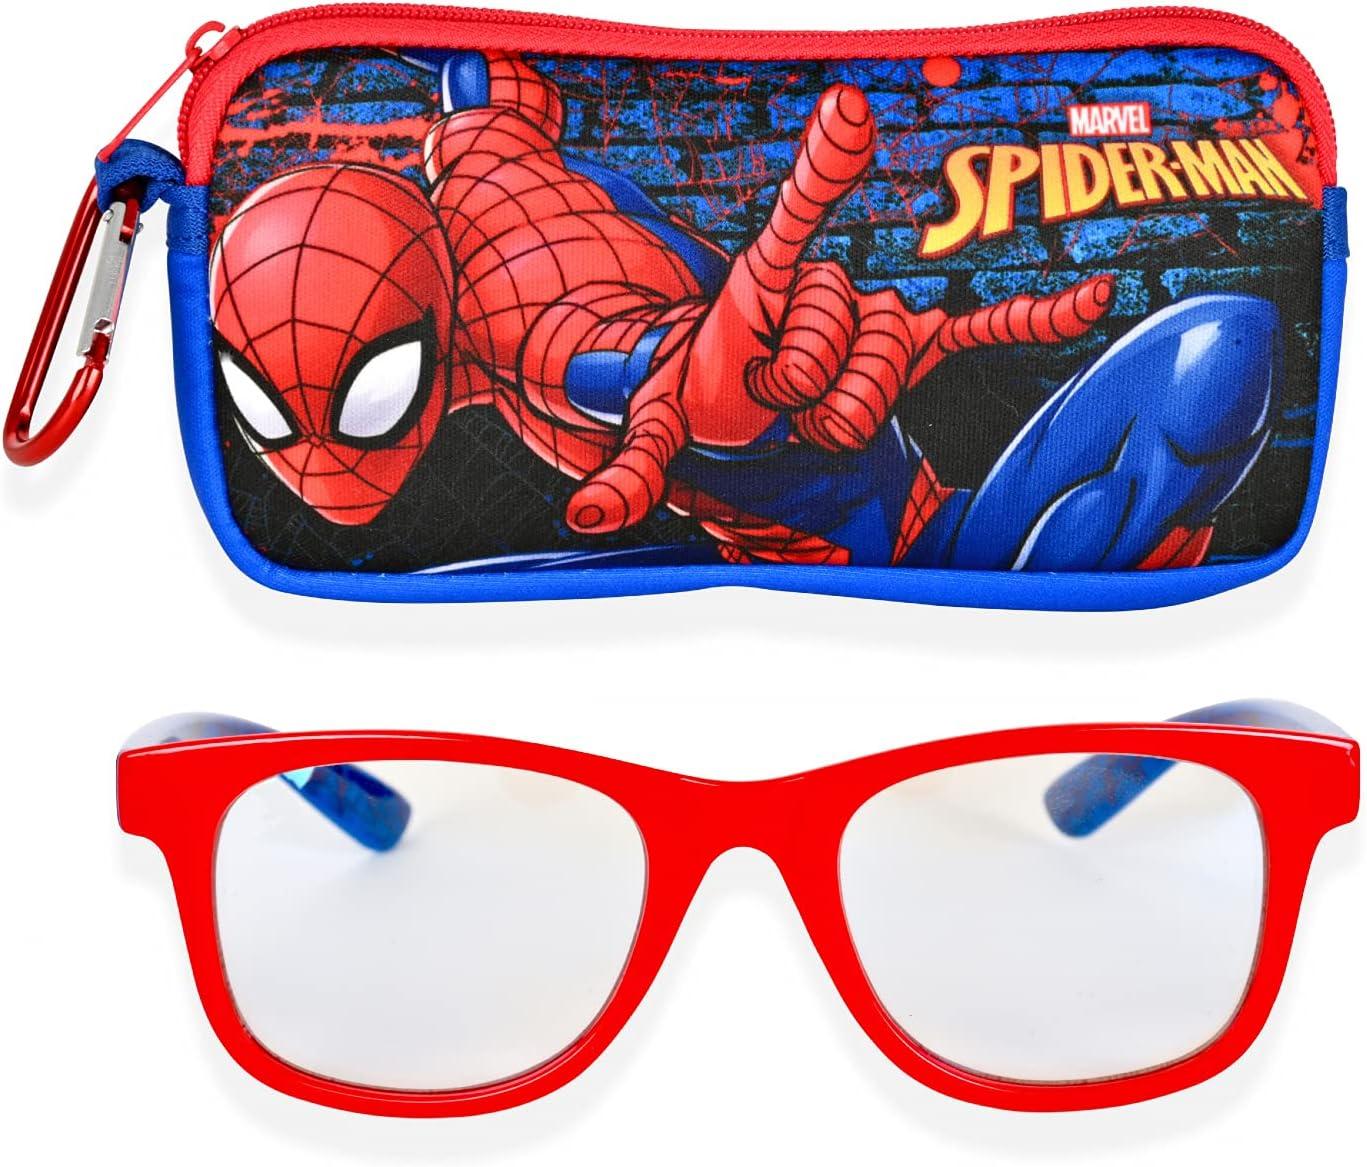 Spiderman Blue Light Glasses for Kids Computer Eyeglasses with Carrying Case | Blue Light Blocking Glasses for Boys Childrens Gaming Glasses (Red/Blue)